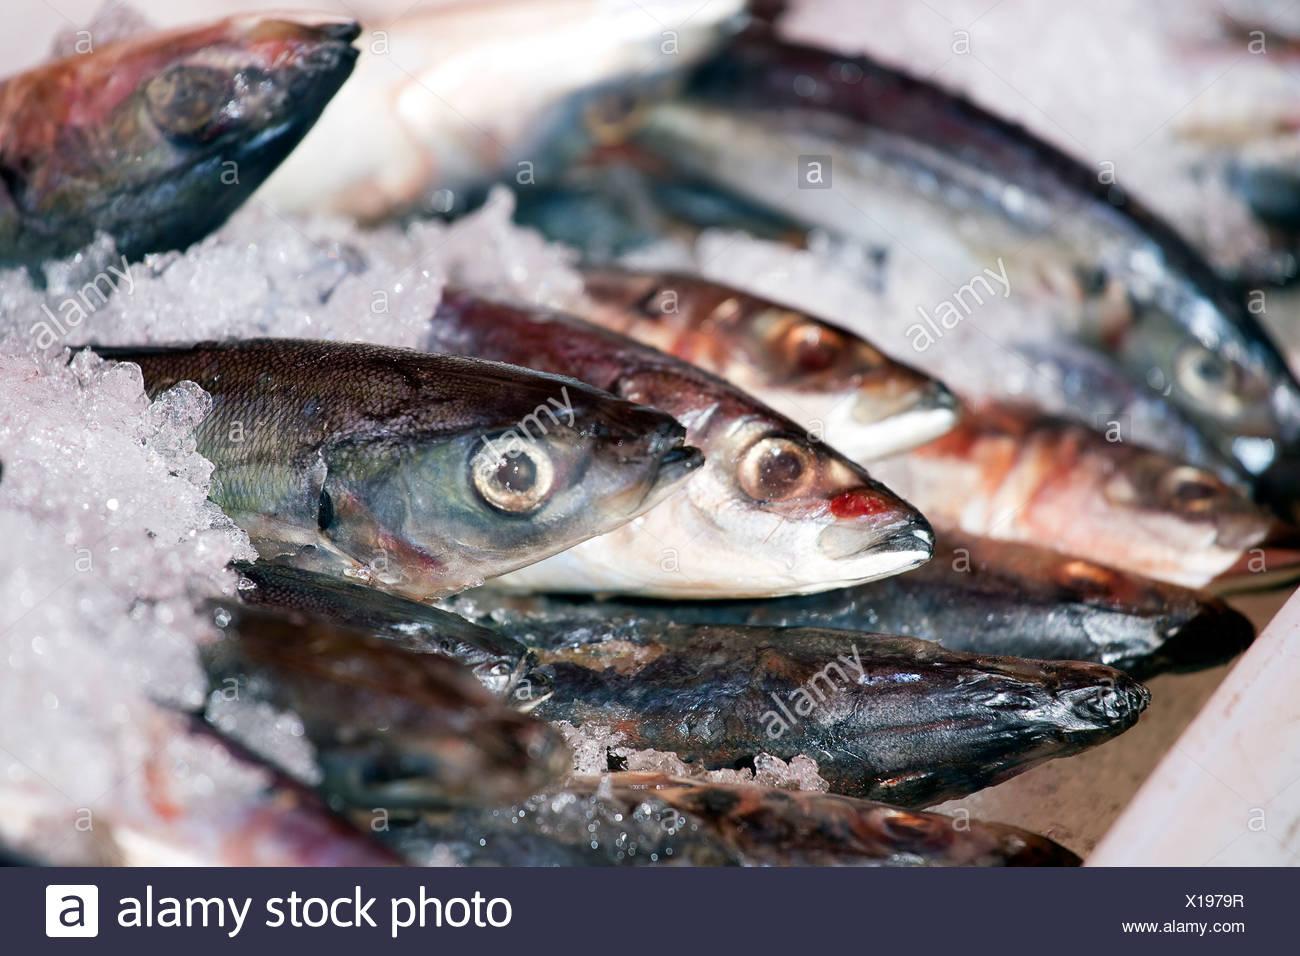 Fresh sardines on ice at the market - Stock Image